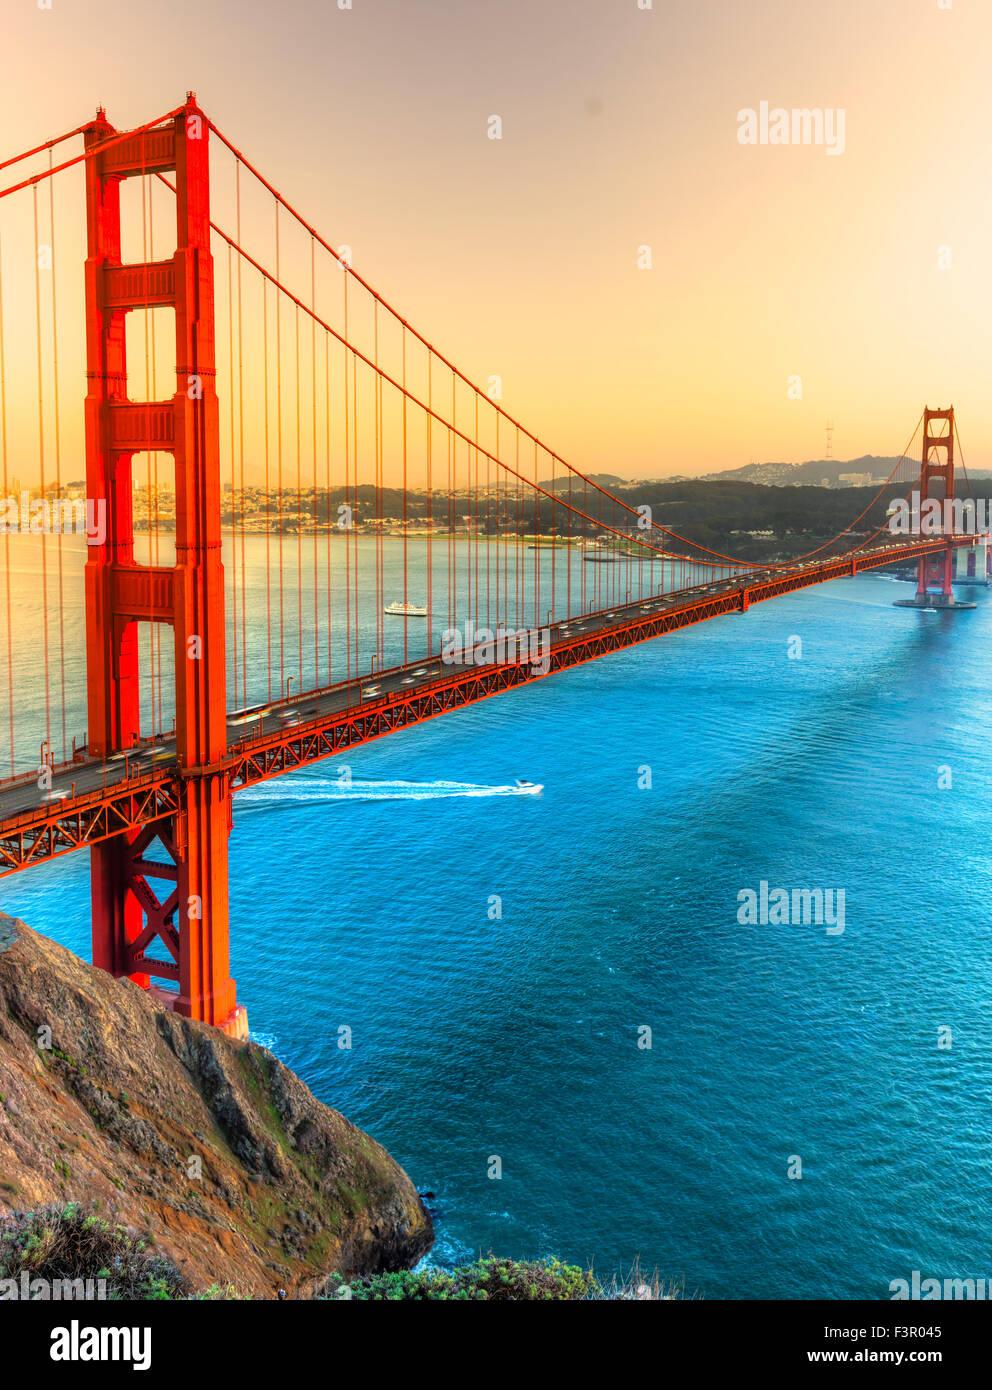 Golden Gate Bridge, San Francisco, California, USA. - Stock Image